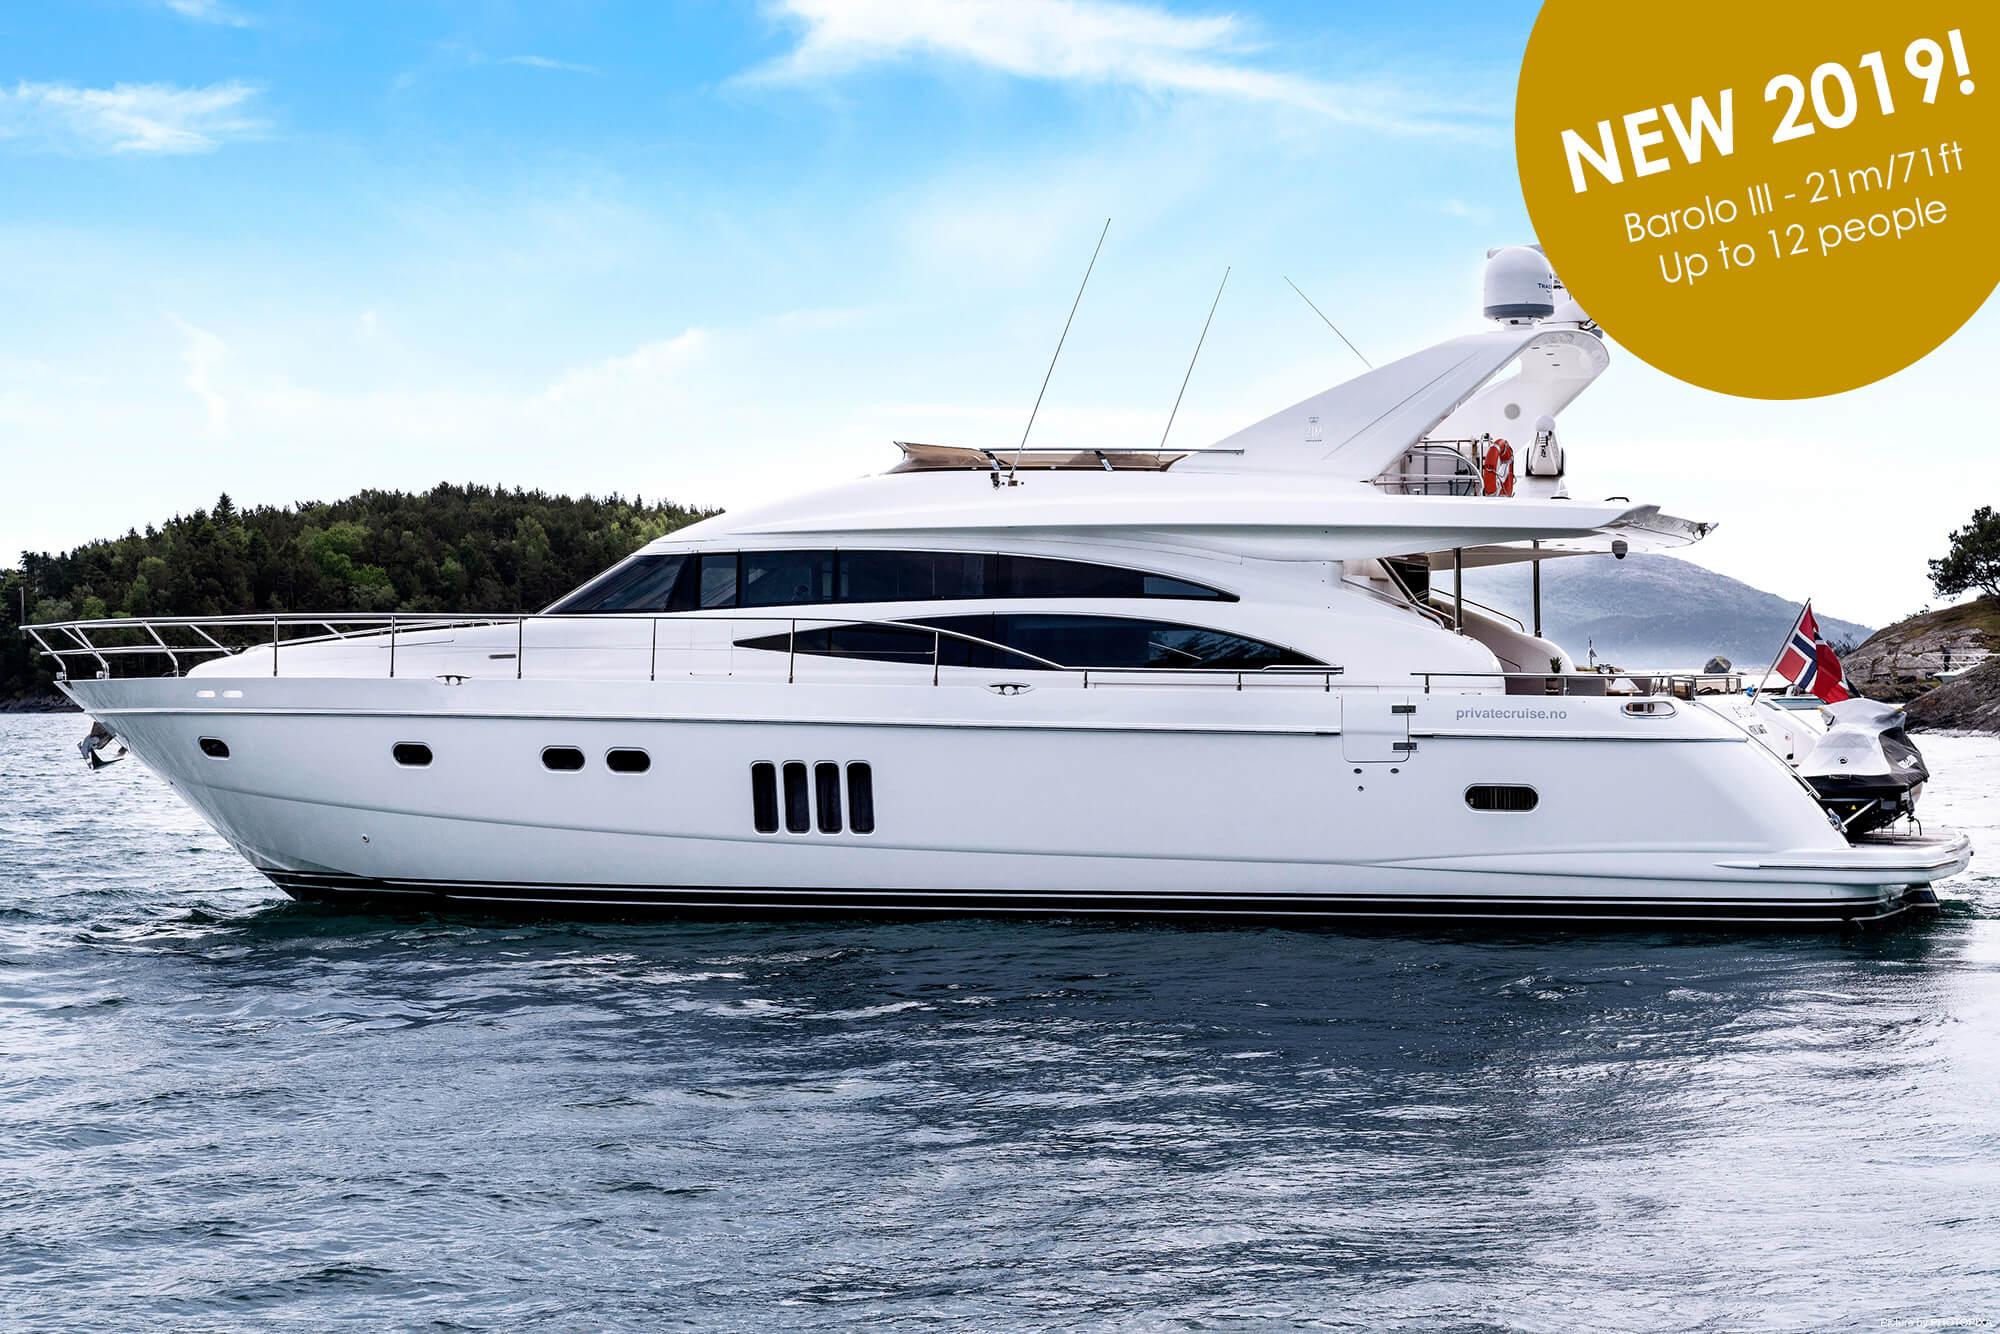 barolo new yacht 2019